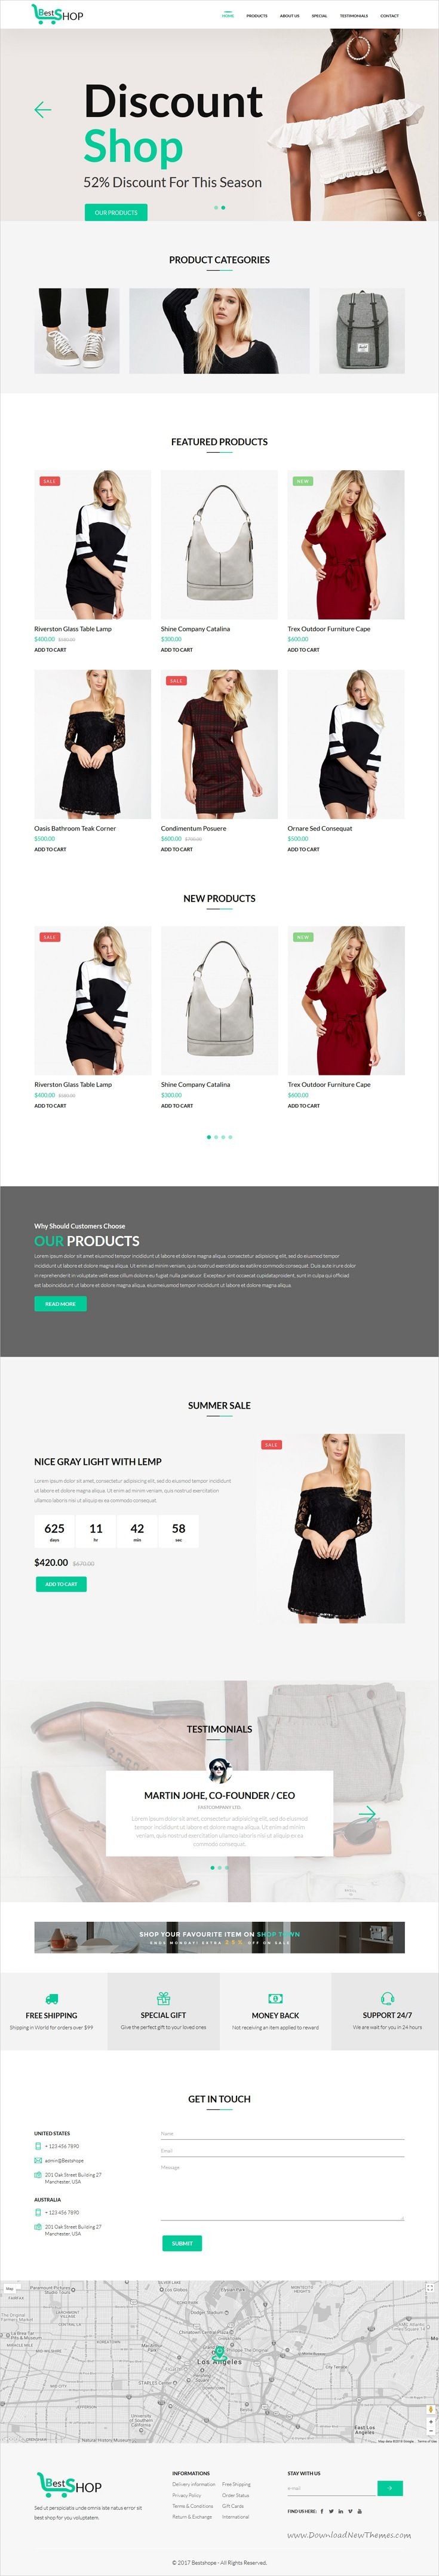 Bestshop One Page Mini Ecommerce Shop Templates Ecommerce Shop Ecommerce Templates